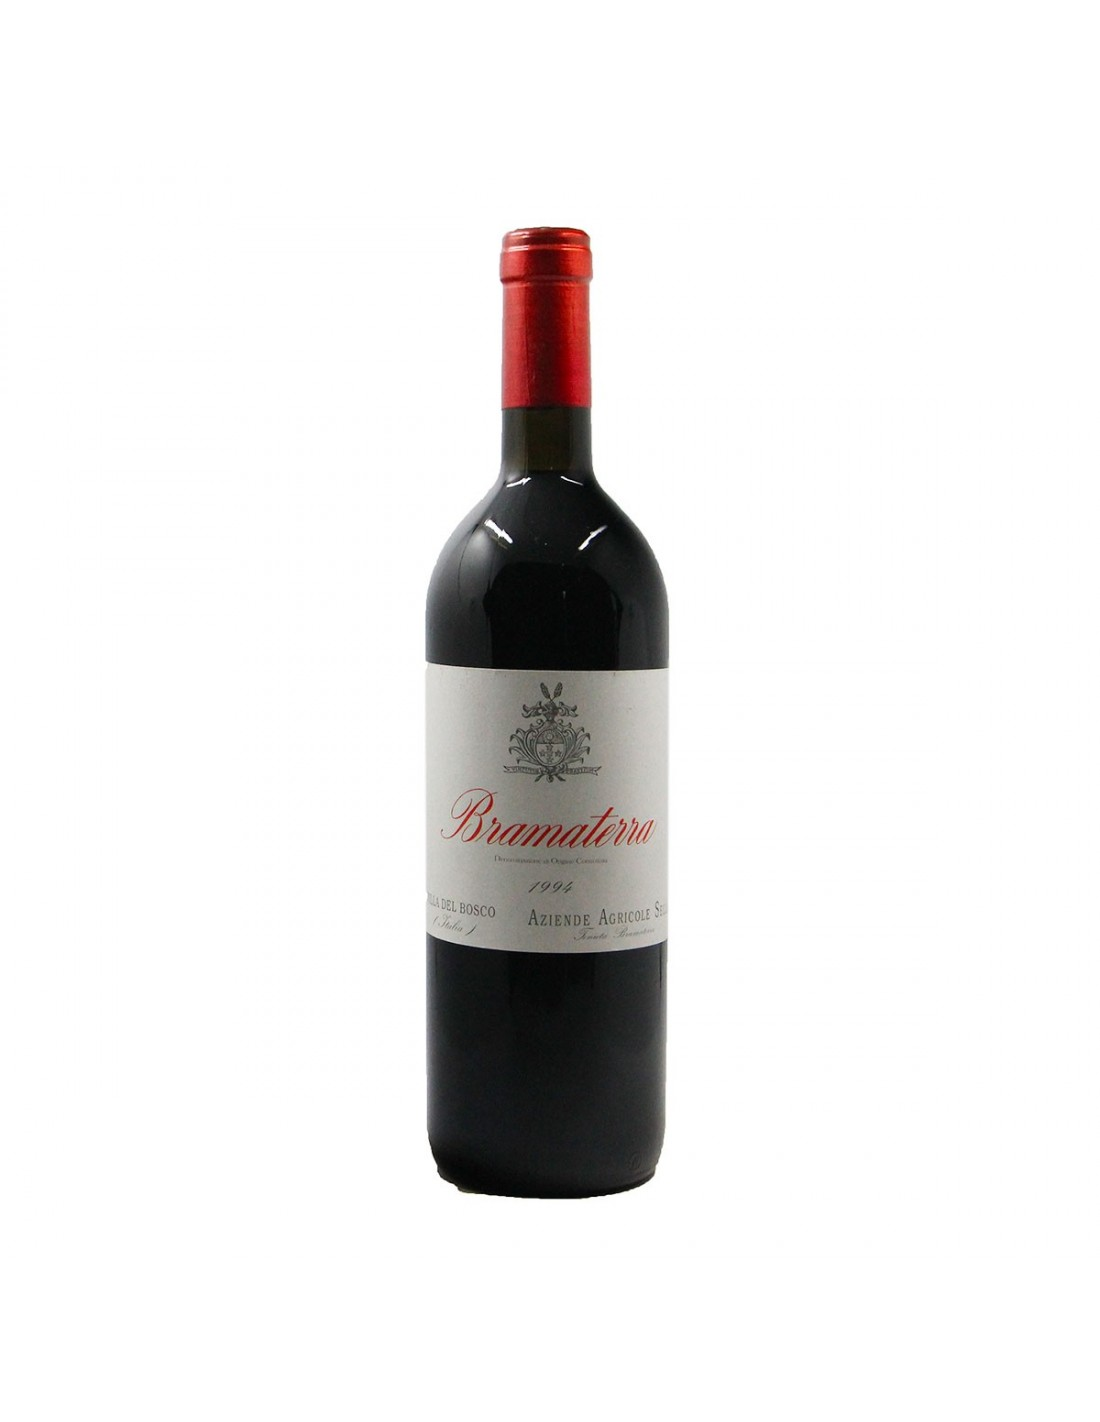 BRAMATERRA 1994 AZIENDA AGRICOLA SELLA Grandi Bottiglie